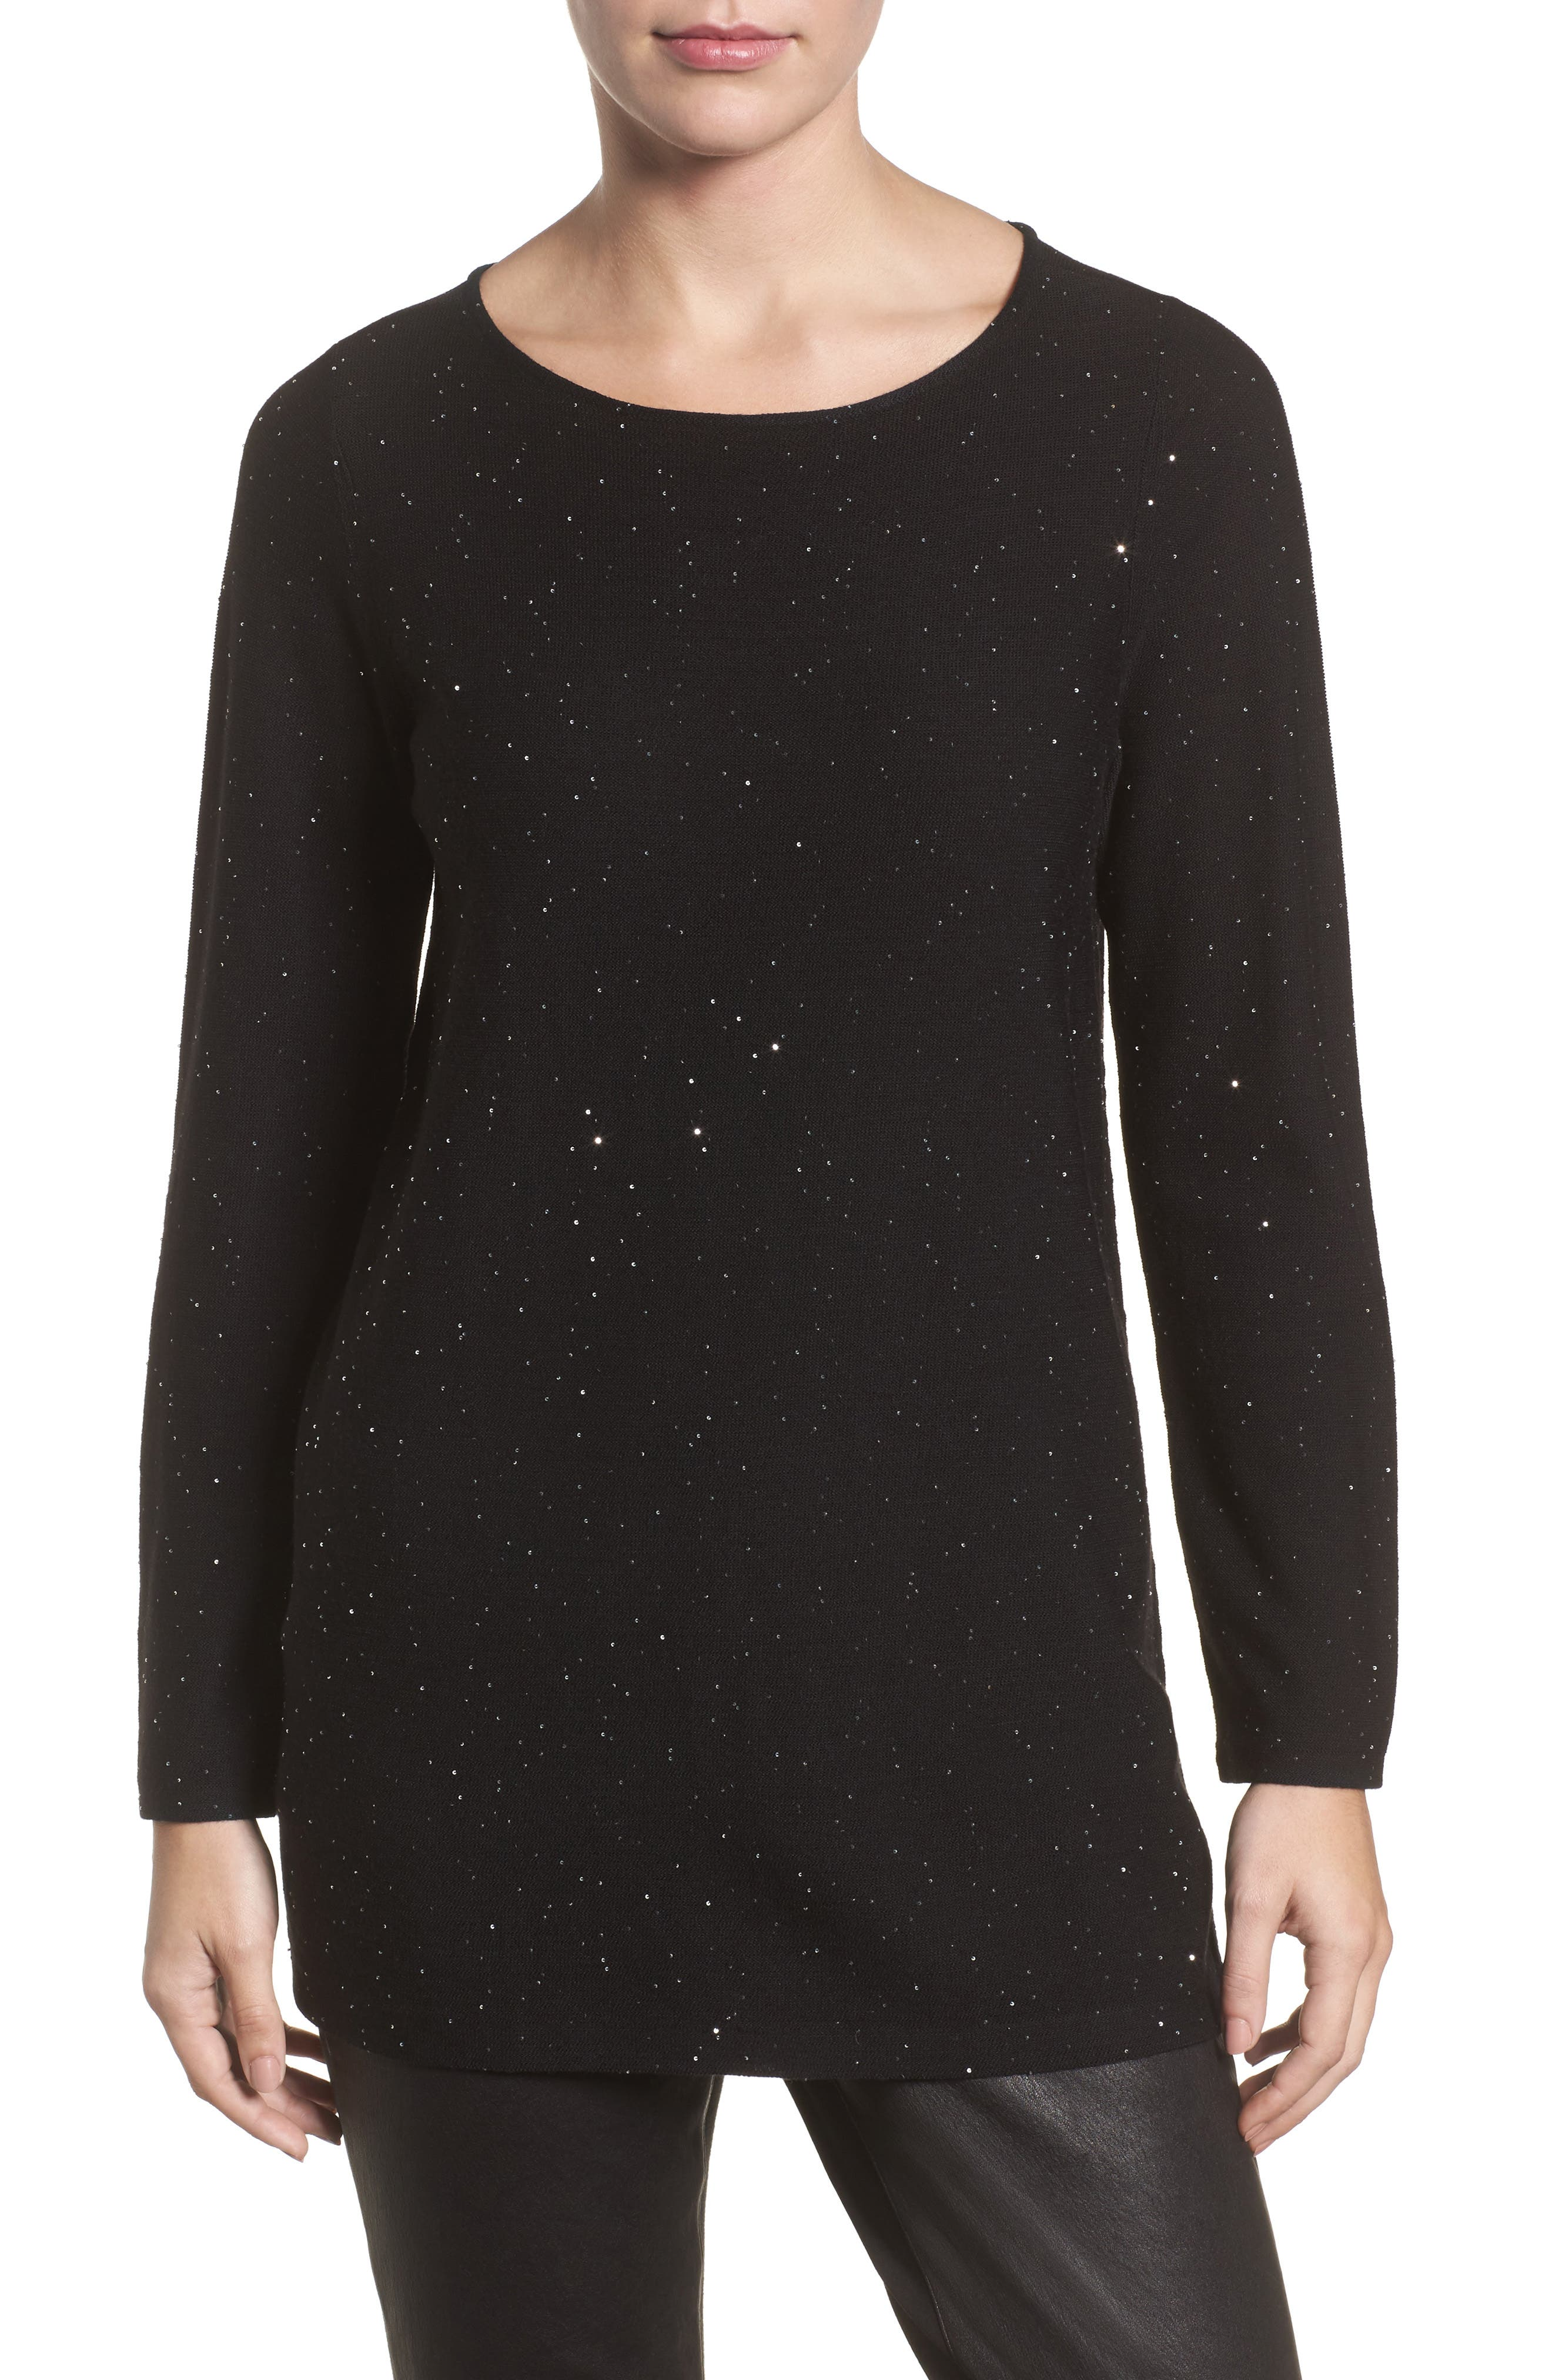 Sequin Merino Wool Sweater,                             Main thumbnail 1, color,                             001